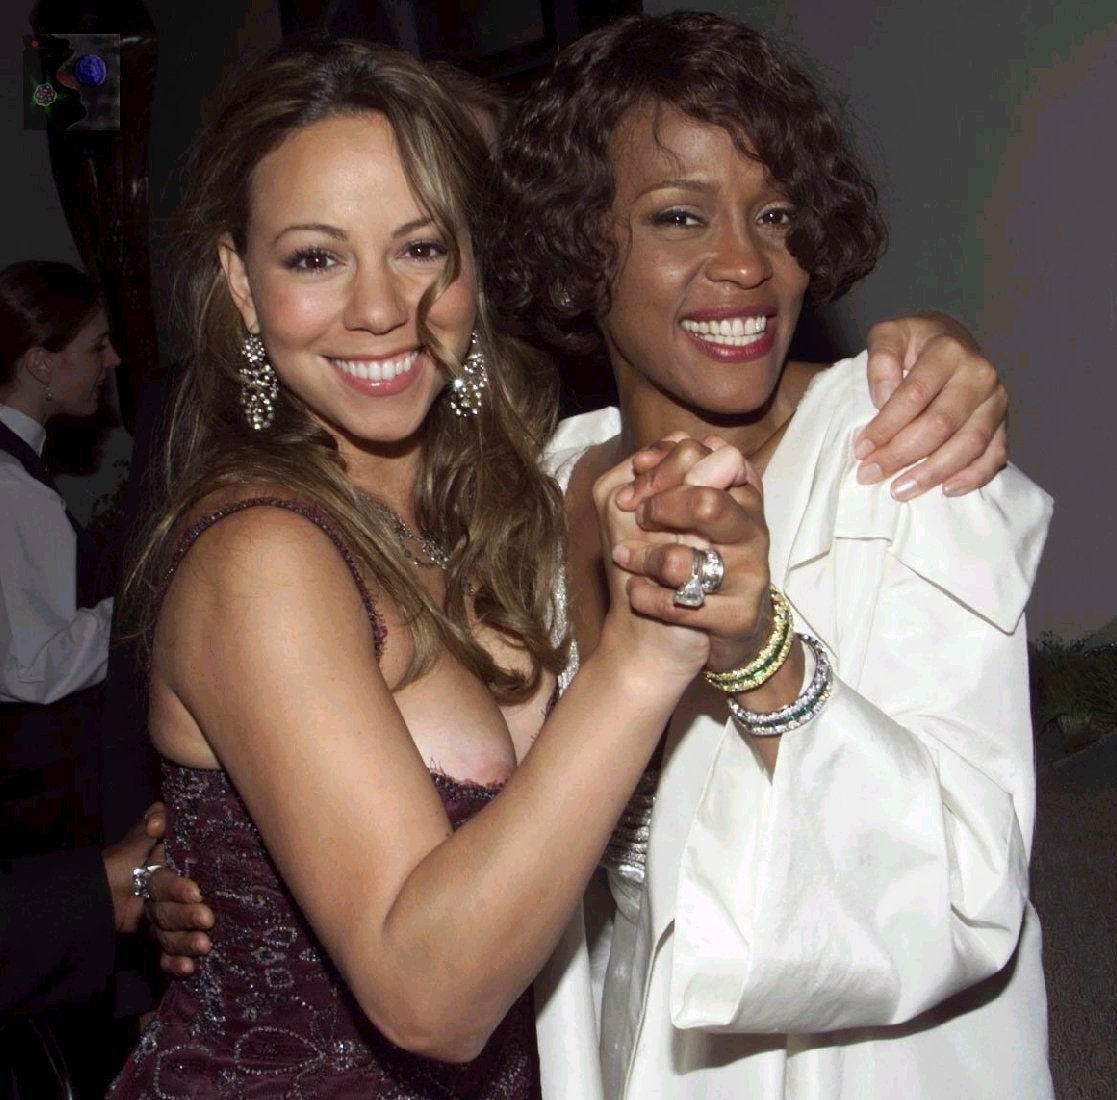 http://1.bp.blogspot.com/-cmCYcUWQvBw/TzchDQ04UAI/AAAAAAAAGQM/hiRKBV_ba8I/s1600/Mariah_Carey+y+Whitney.jpg